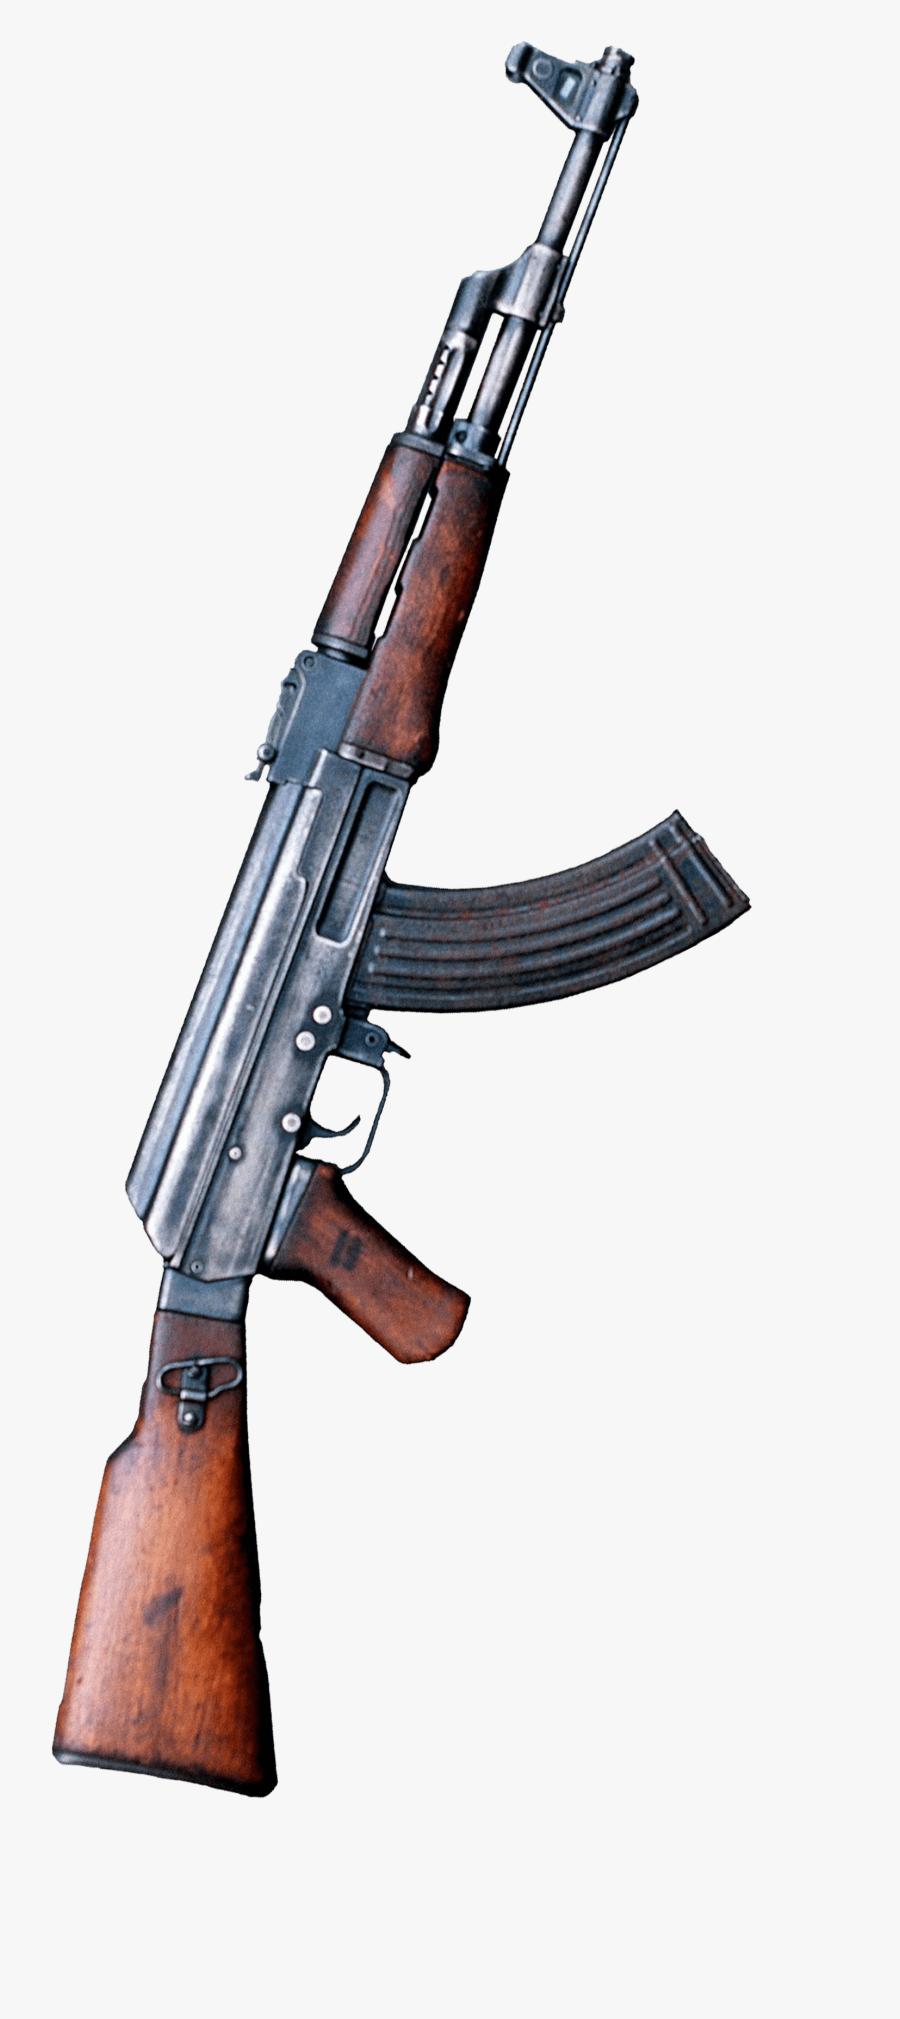 Pubg Guns Png Full Hd - Pubg Gun Hd Png, Transparent Clipart